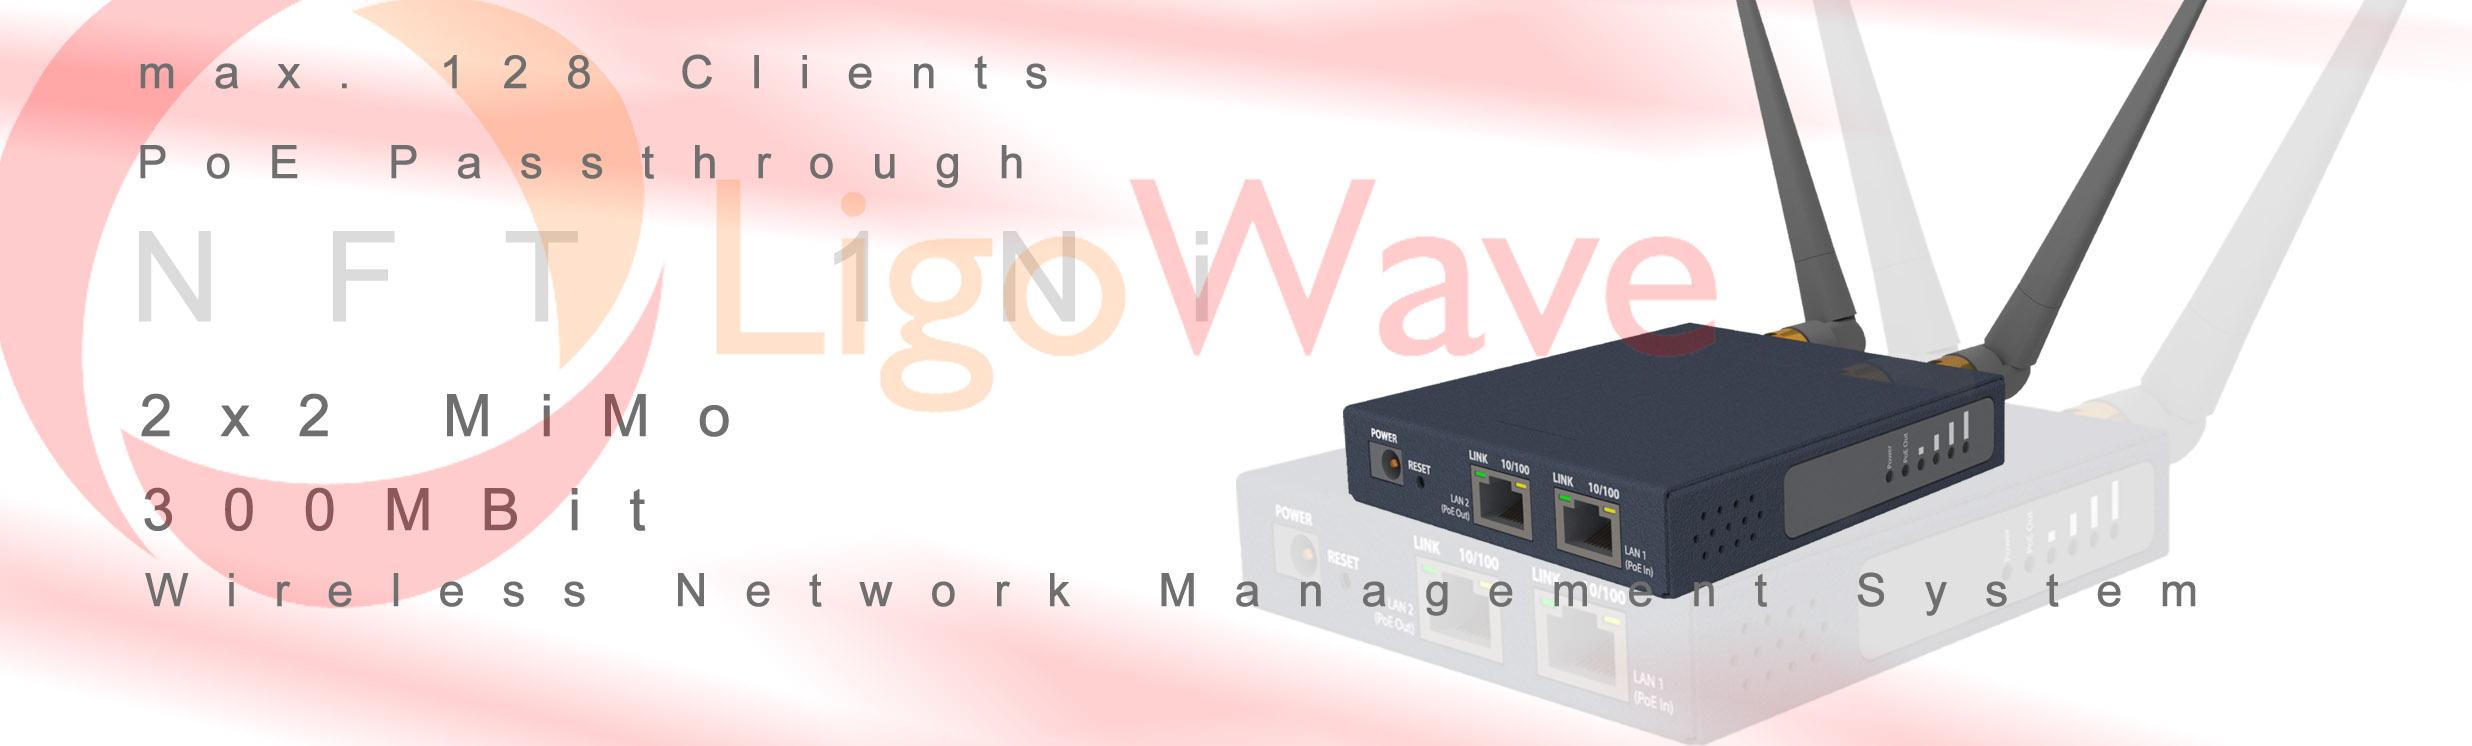 LigoWave NFT 1Ni | 2.4 GHz WLAN Access Point,